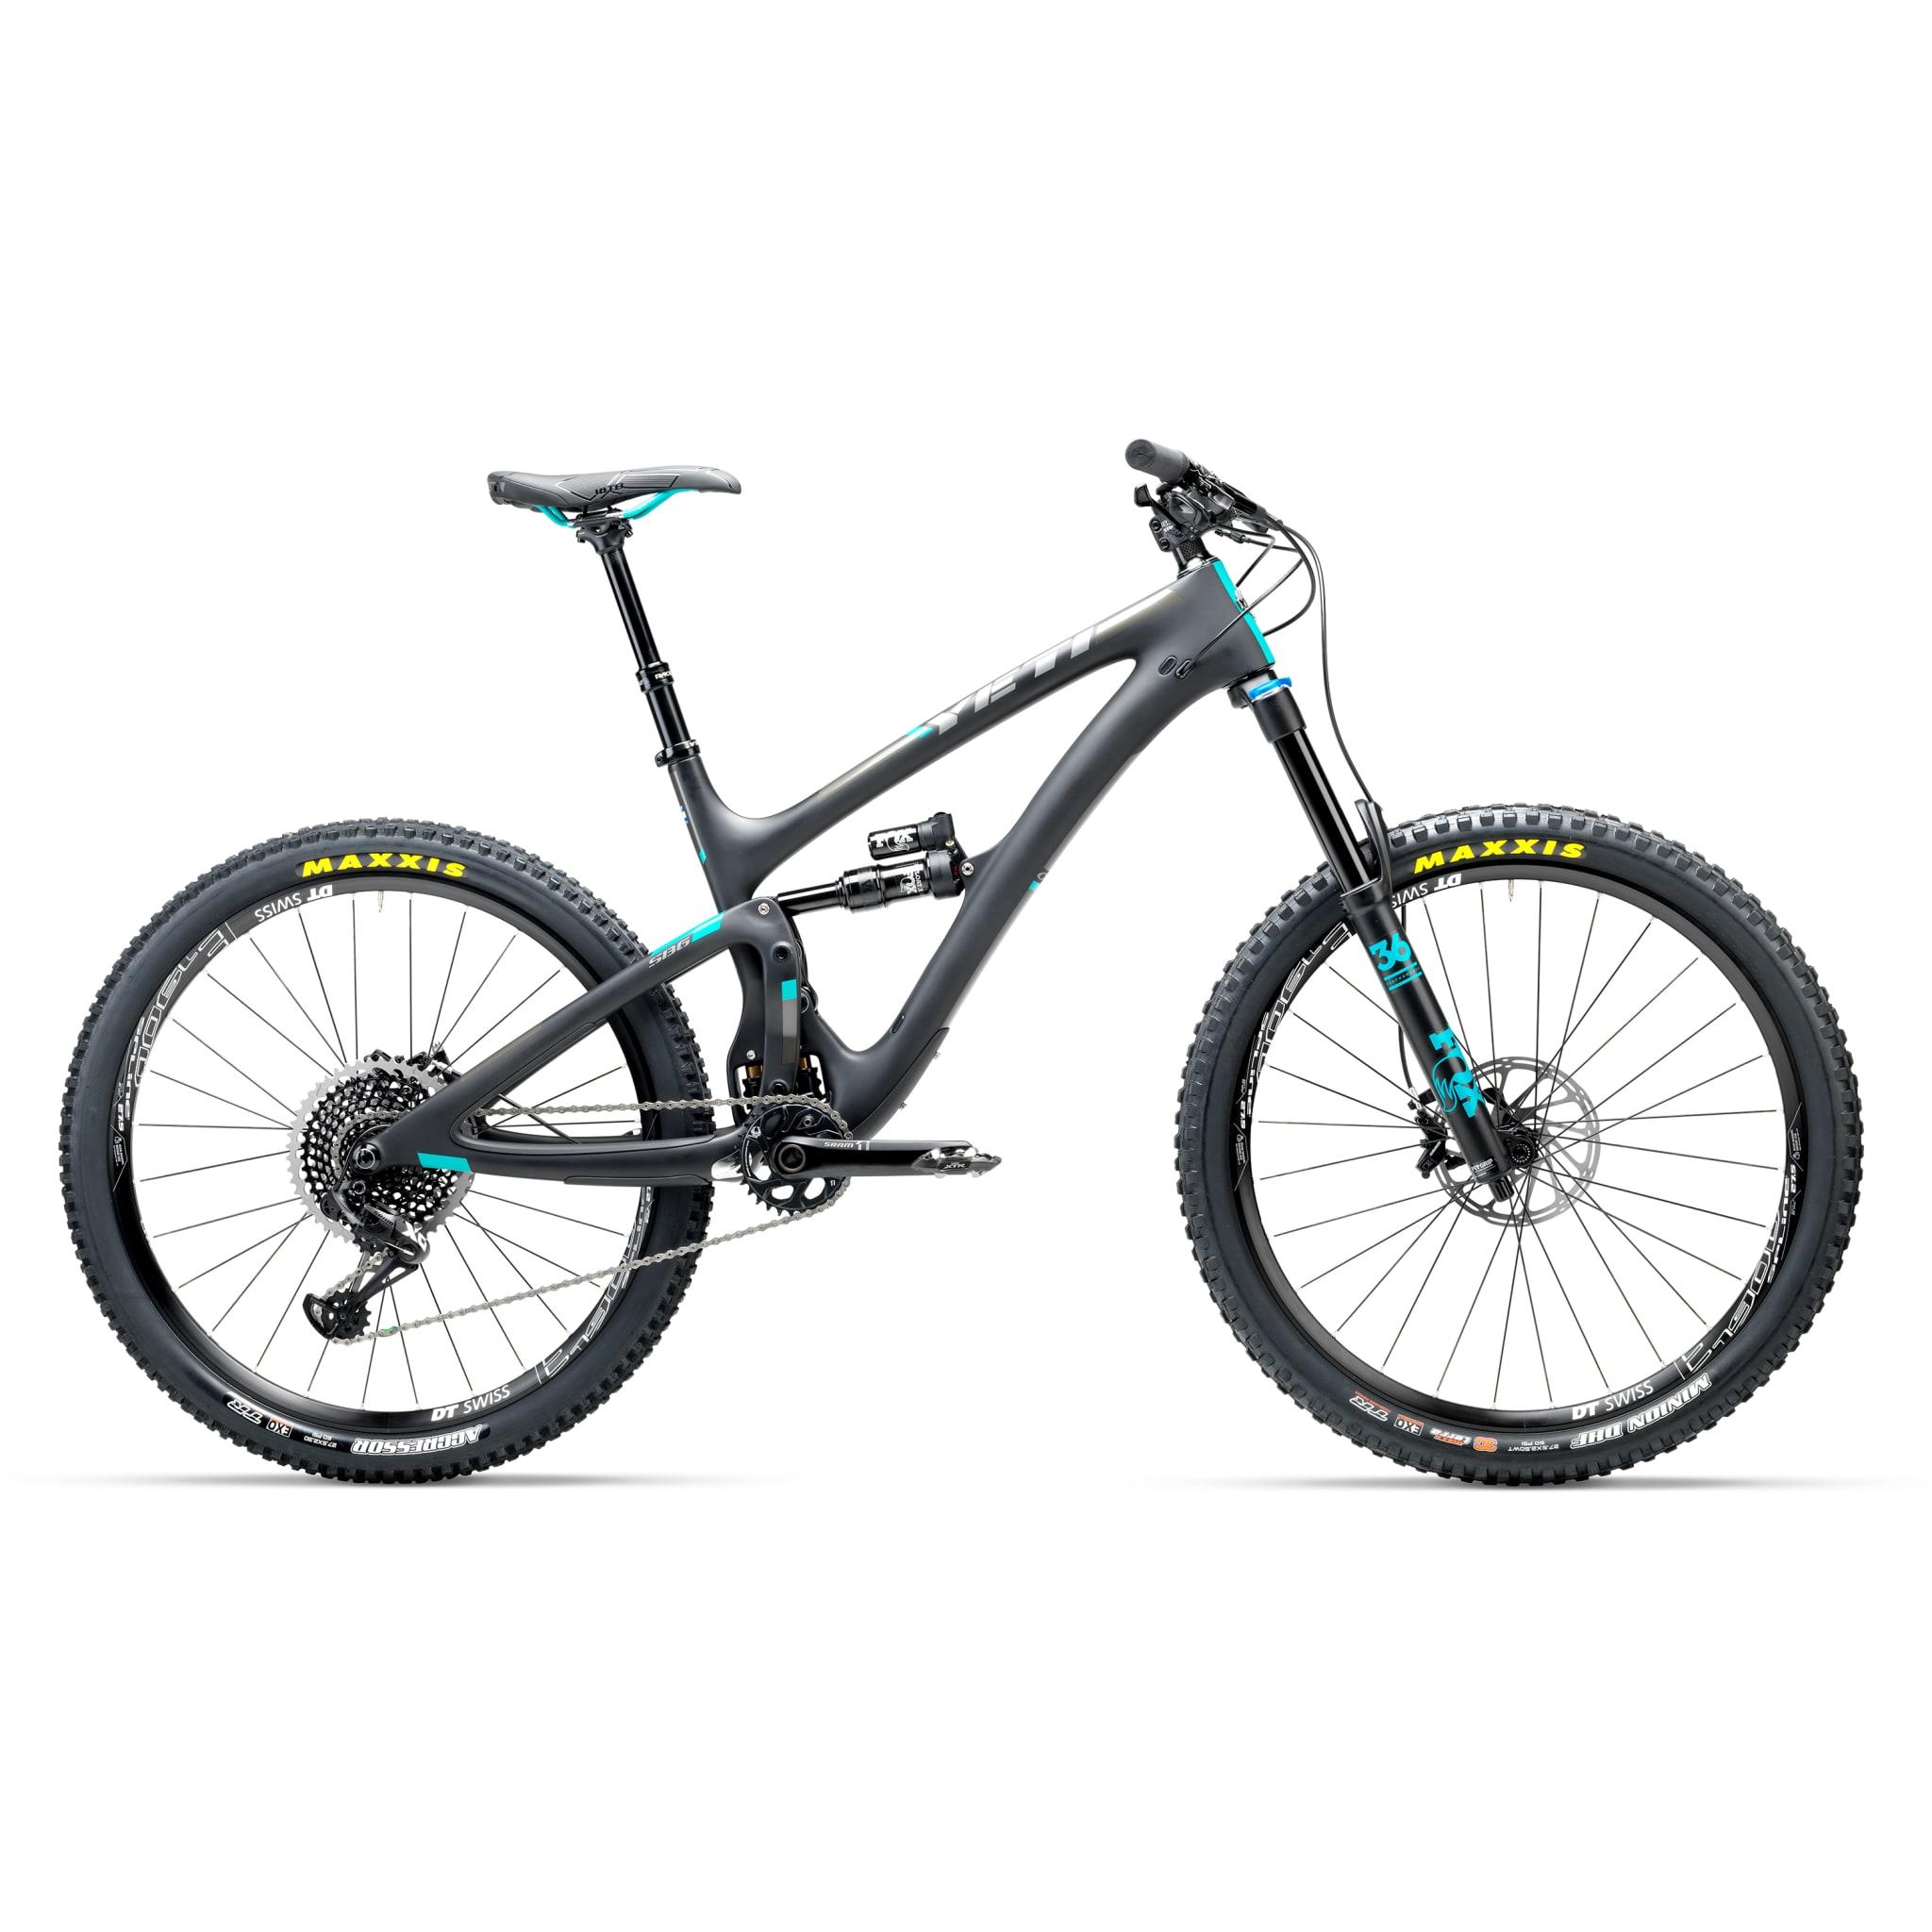 2017 Yeti SB6 Carbon Eagle